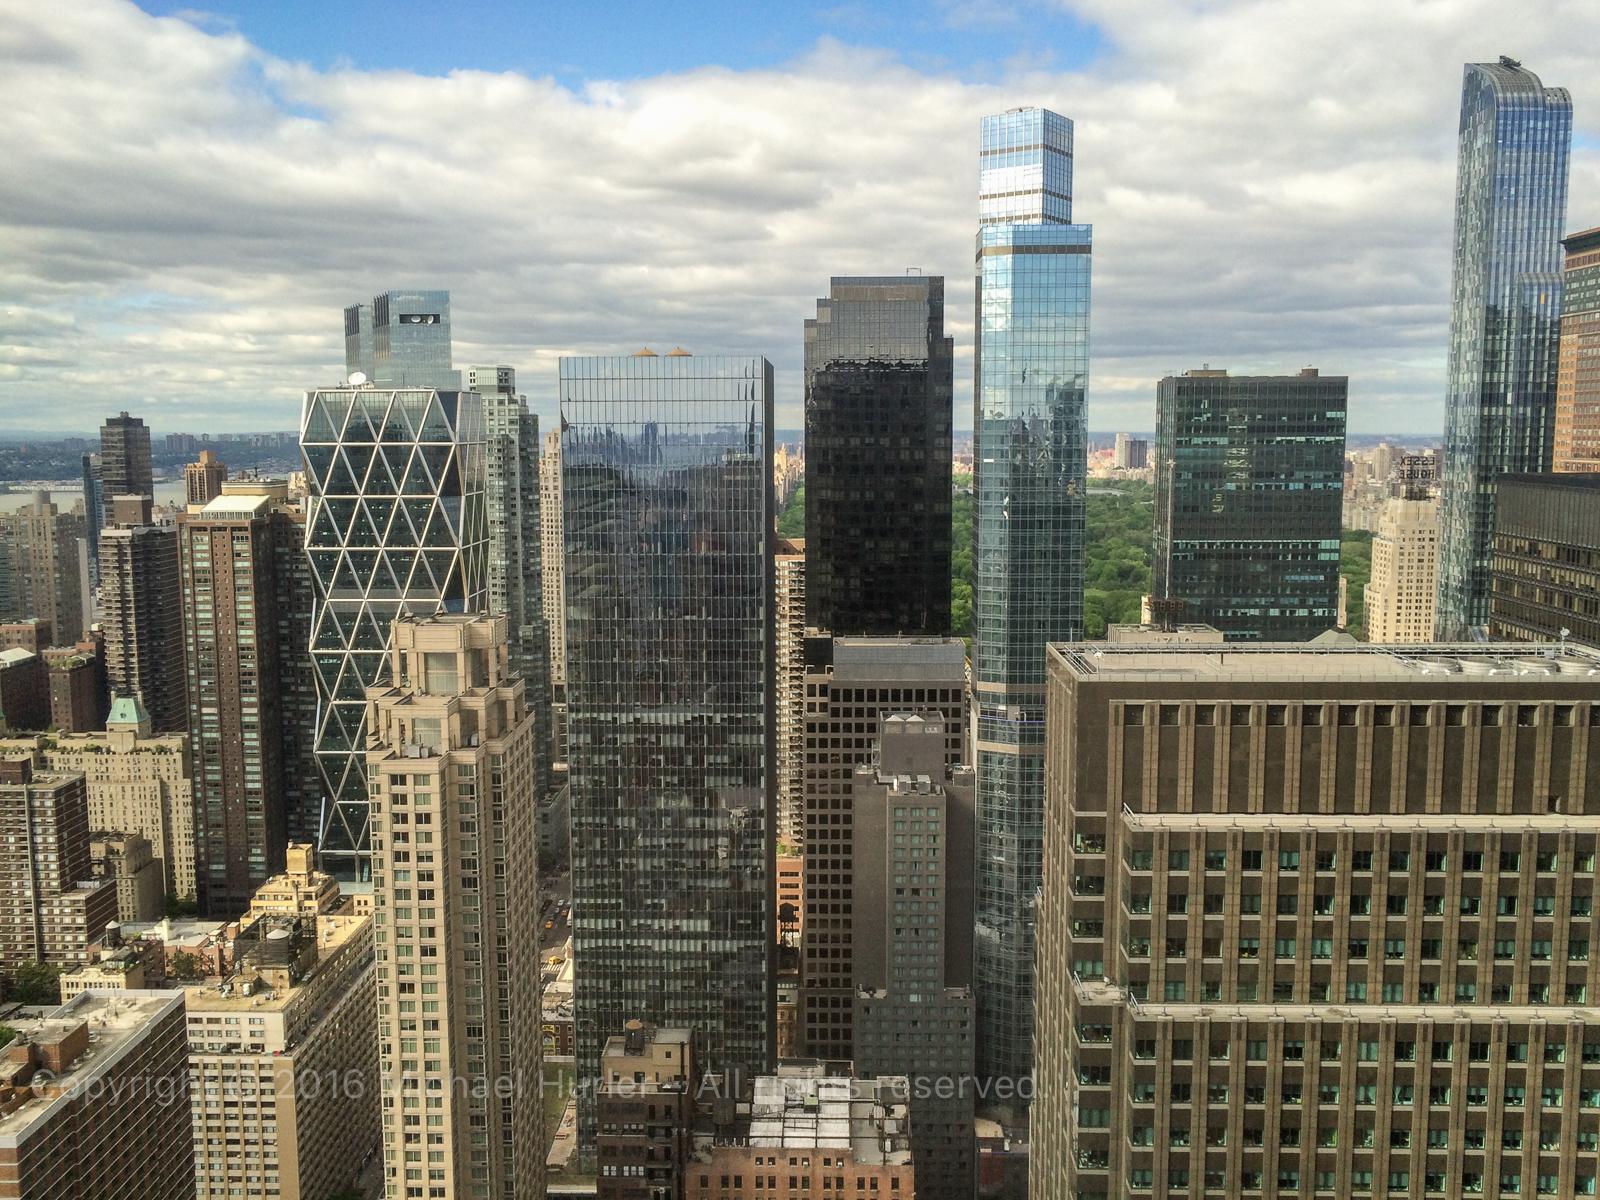 13.05.2015, New York